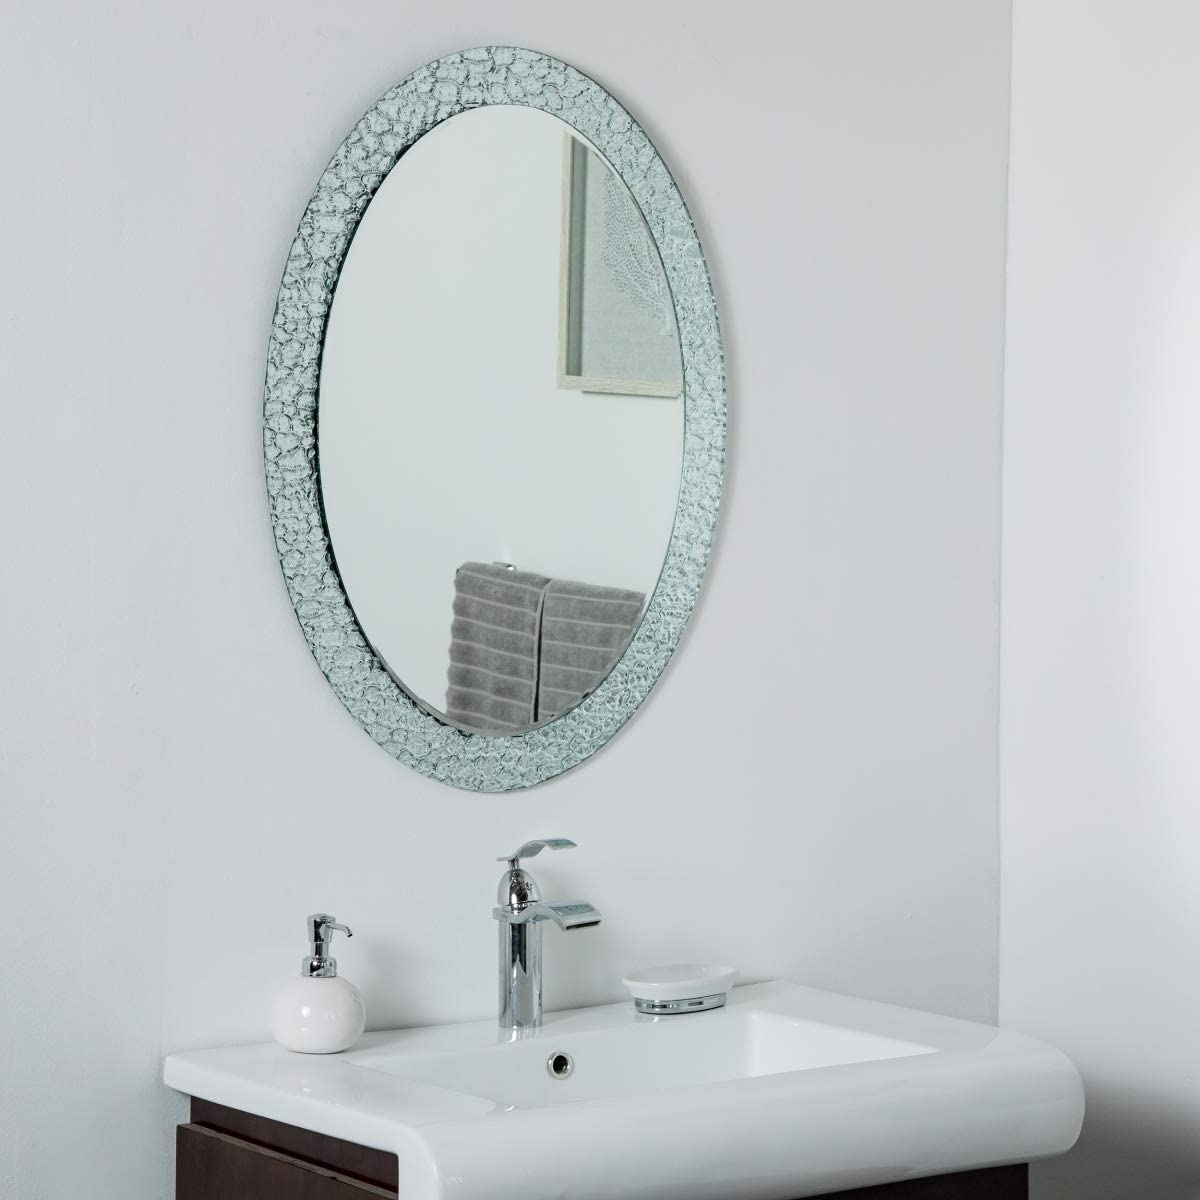 decorWonderland Jewel Frameless 31.5 x 23.6in Oval Wall, Bathroom, Vanity Mirror, 31.5×23.6X.5, Silver